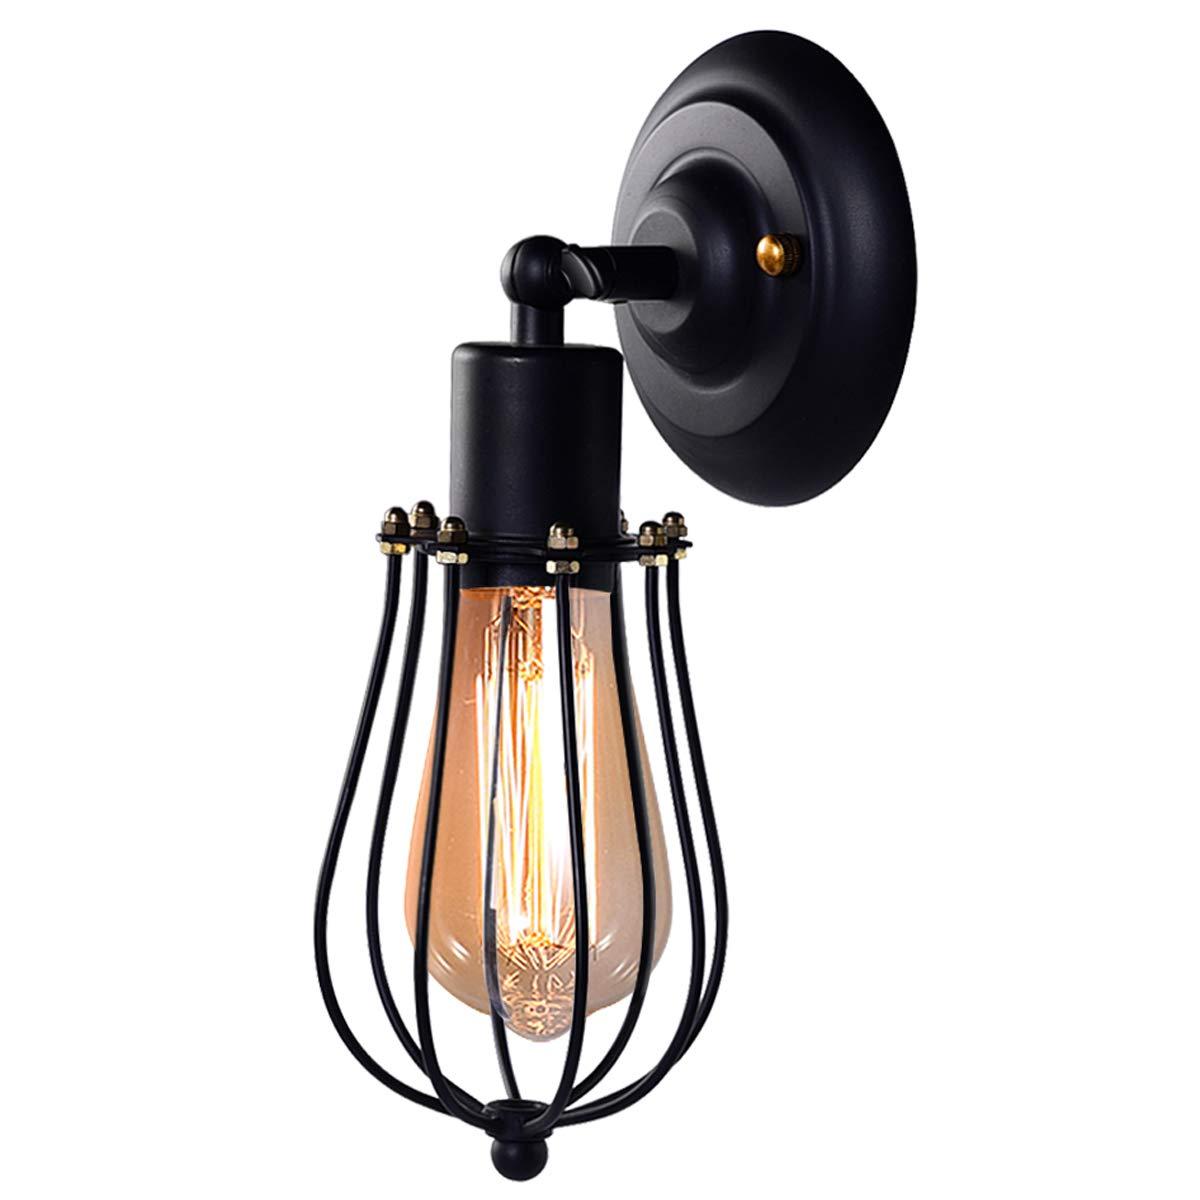 Vintage Wall Light Fixtures: Amazon.com